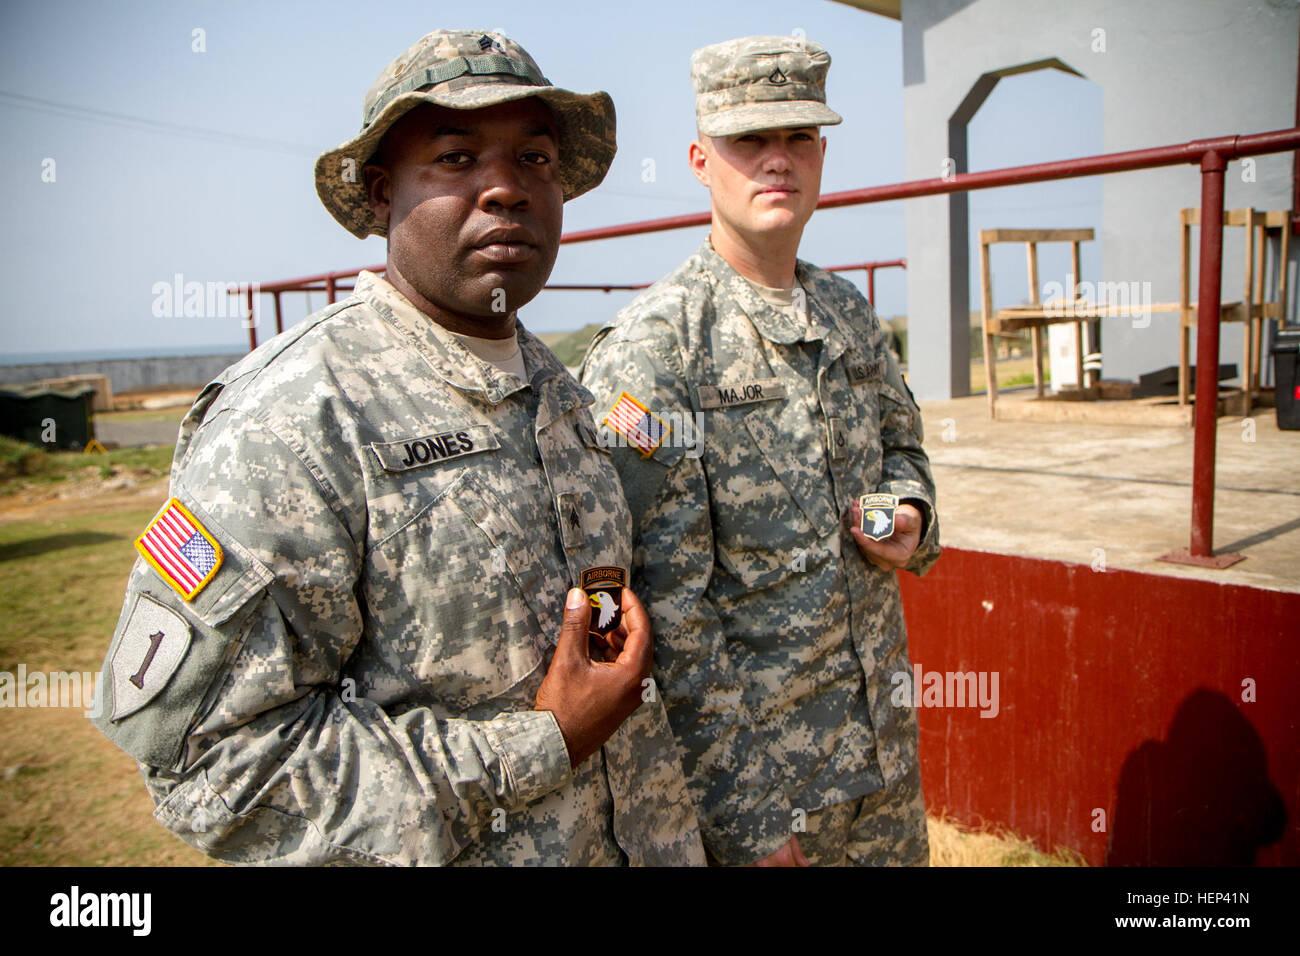 Sgt. Elijah Jones, left, a power generator equipment repairman, with the 82nd Civil Affairs Battalion, and Pfc. - Stock Image